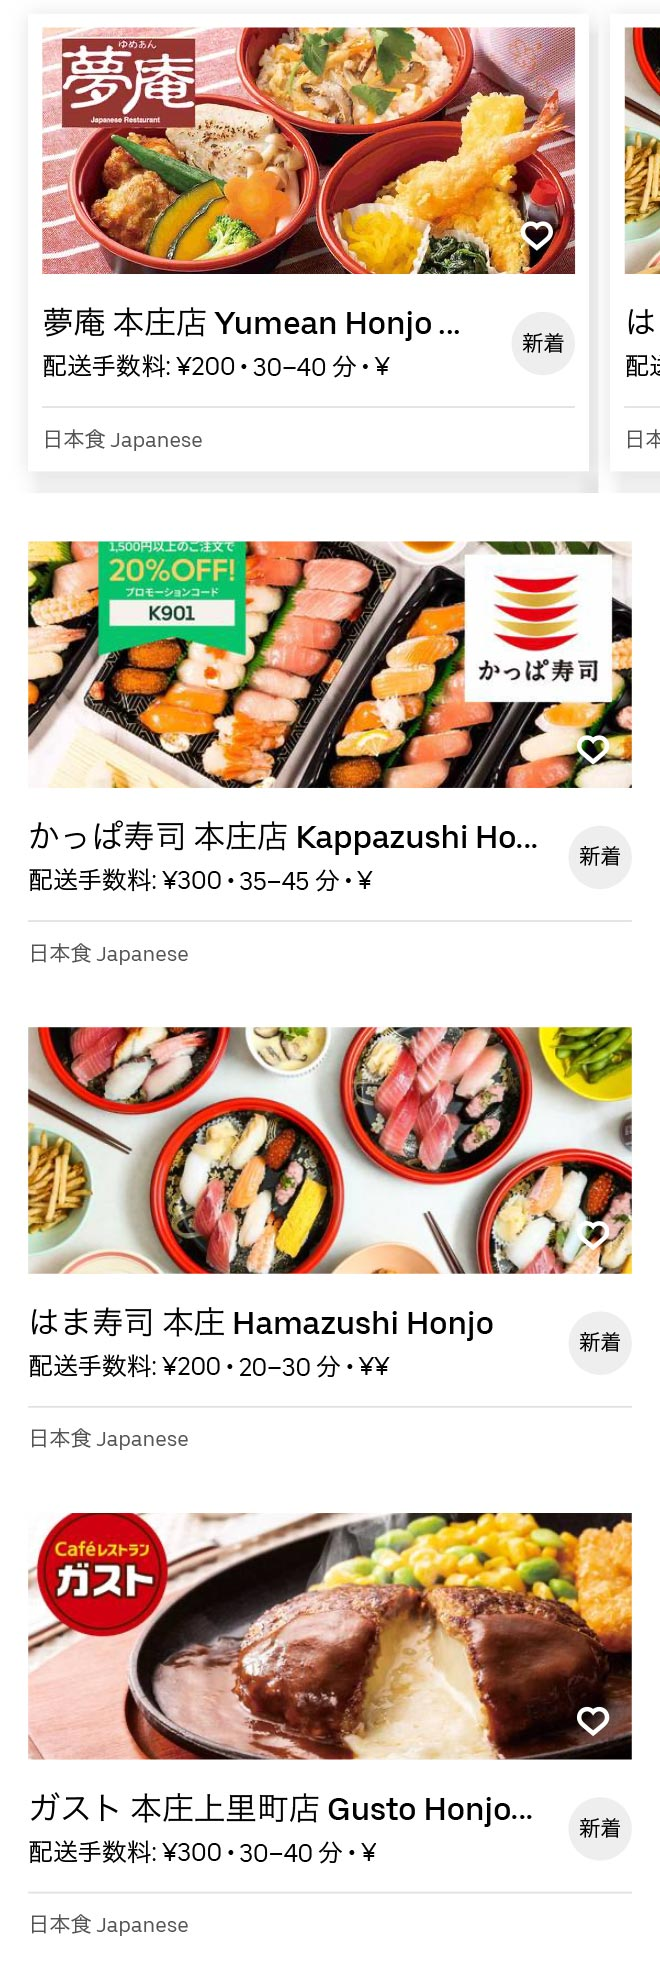 Honjo menu 2010 2